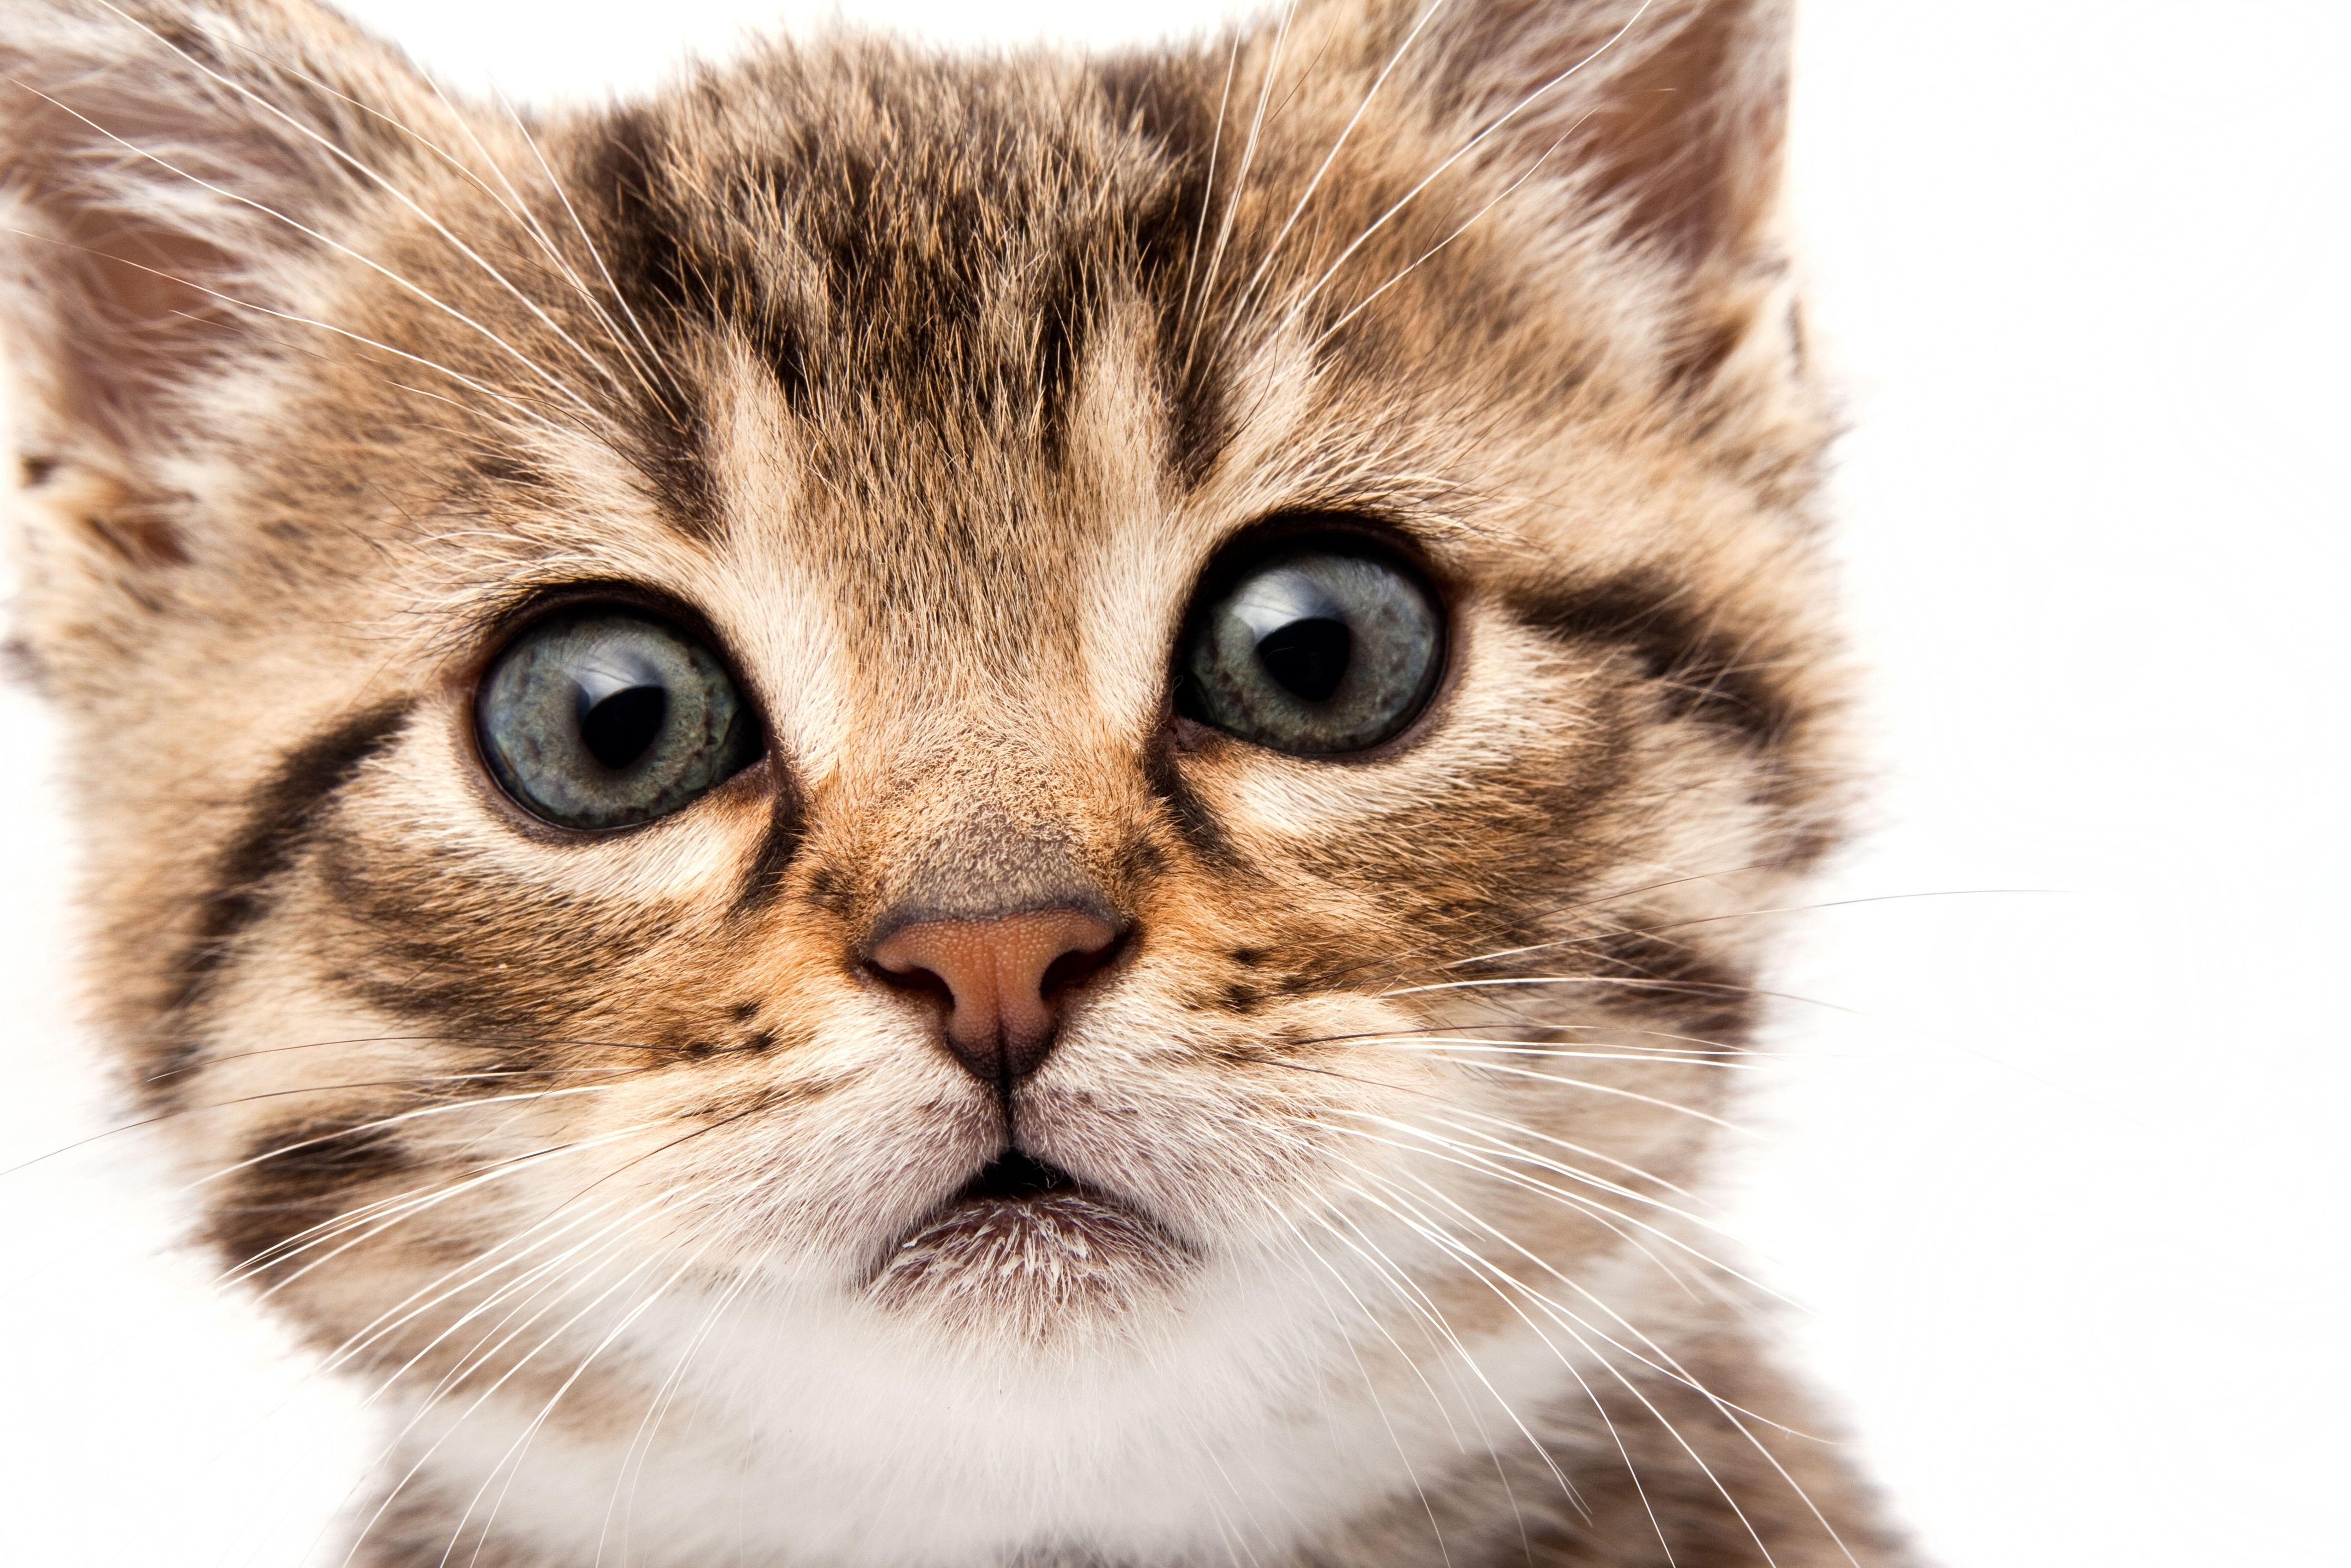 кошка язык глаза сердечки  № 2824824 без смс